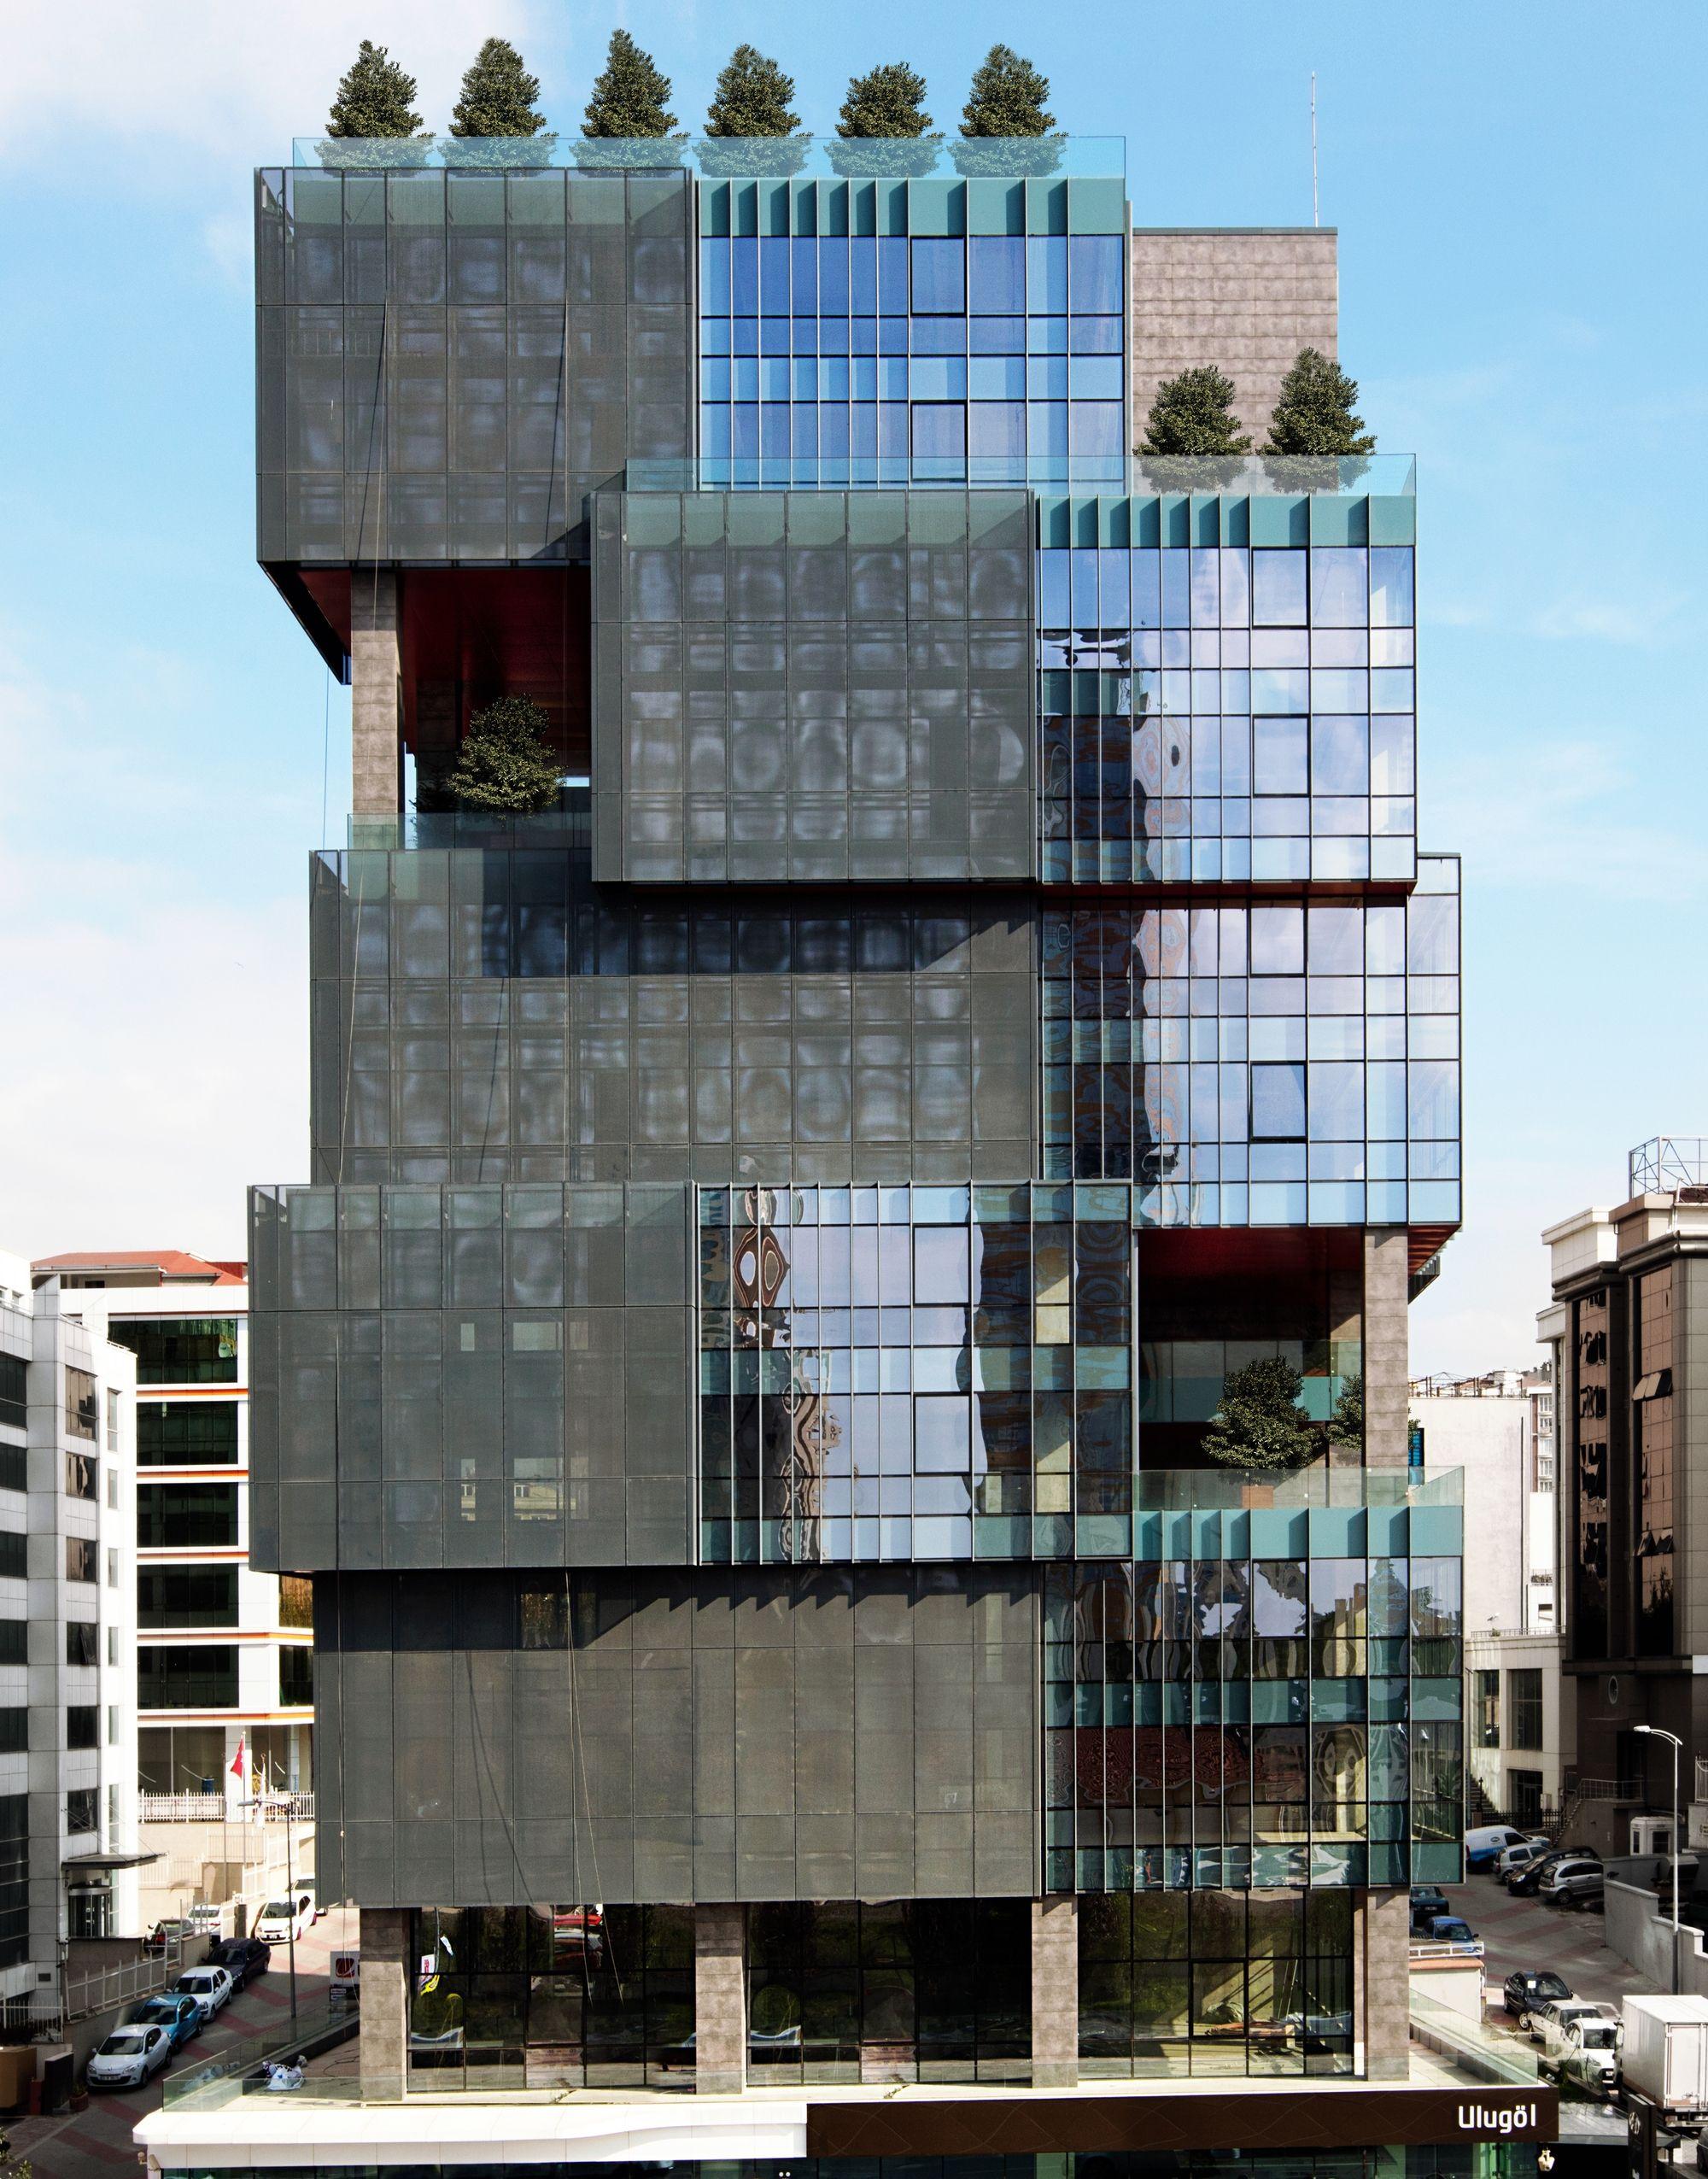 gallery of the ulugöl otomotiv office building / tago architects